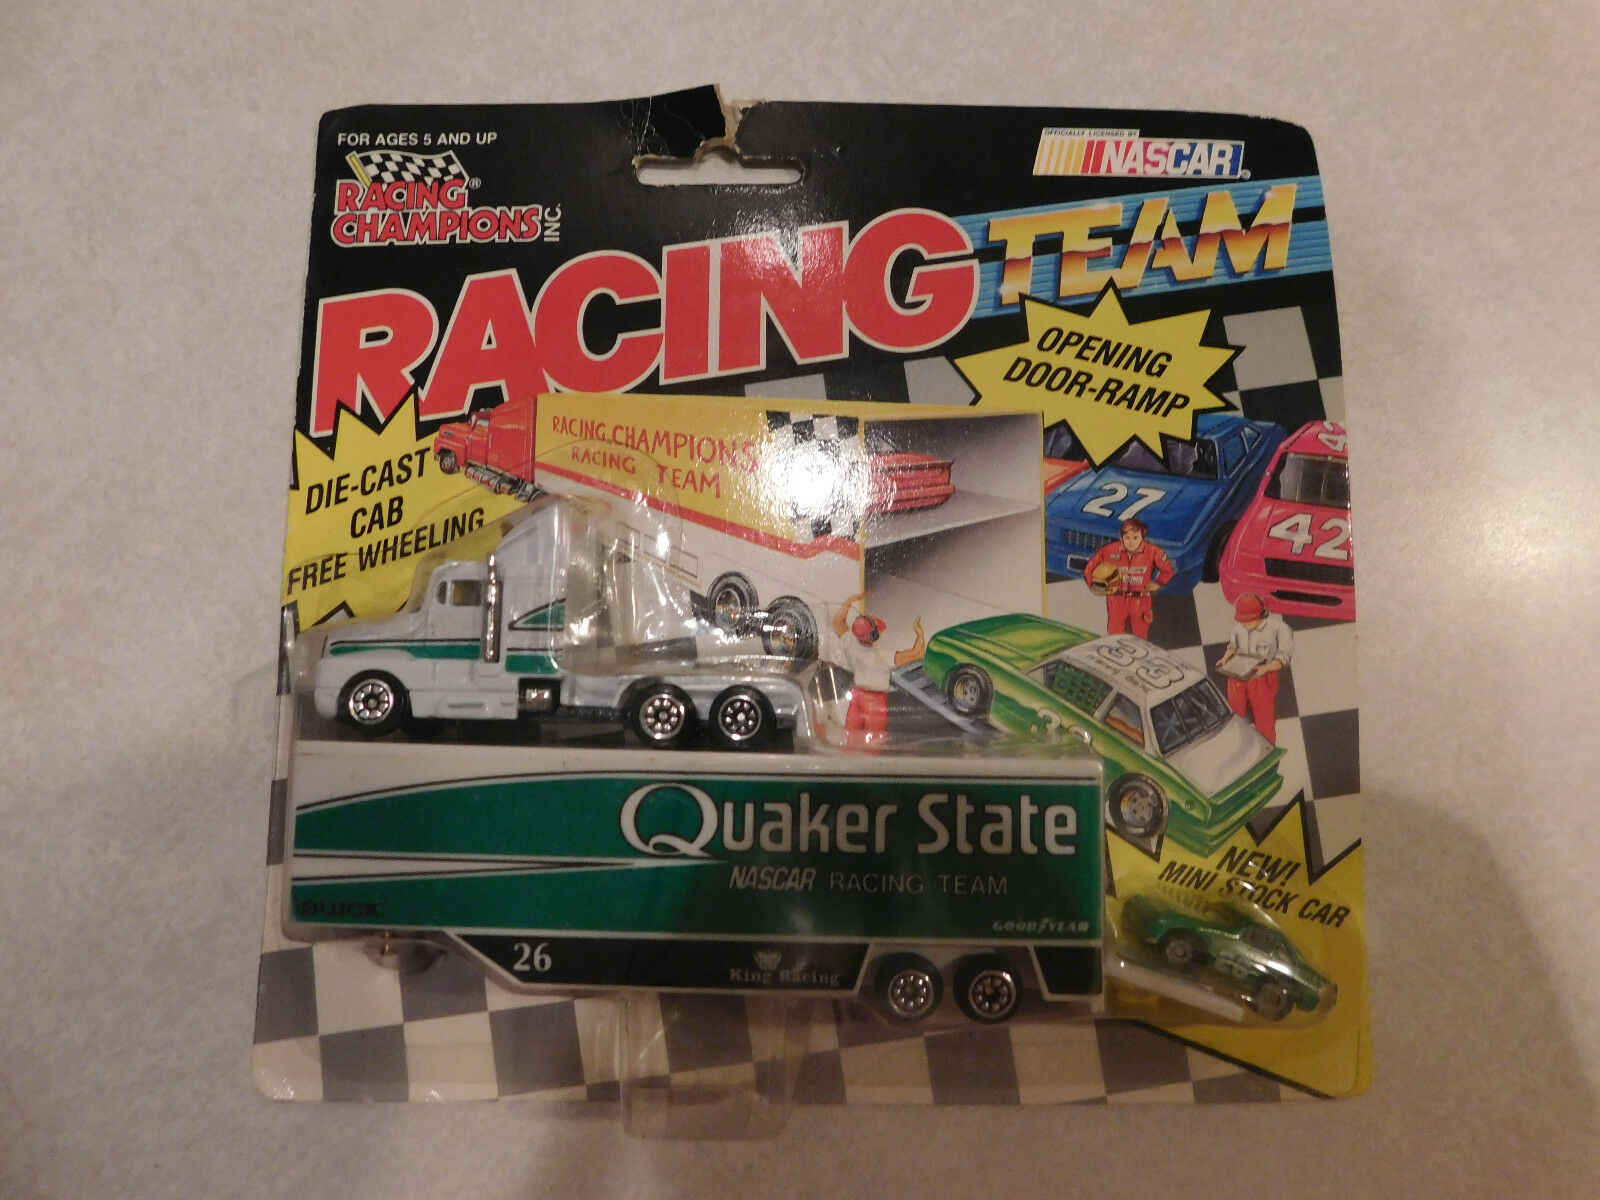 Racing Champion Racing Team Diecast Cab Free-Wheeling Quaker State Nascar Racing